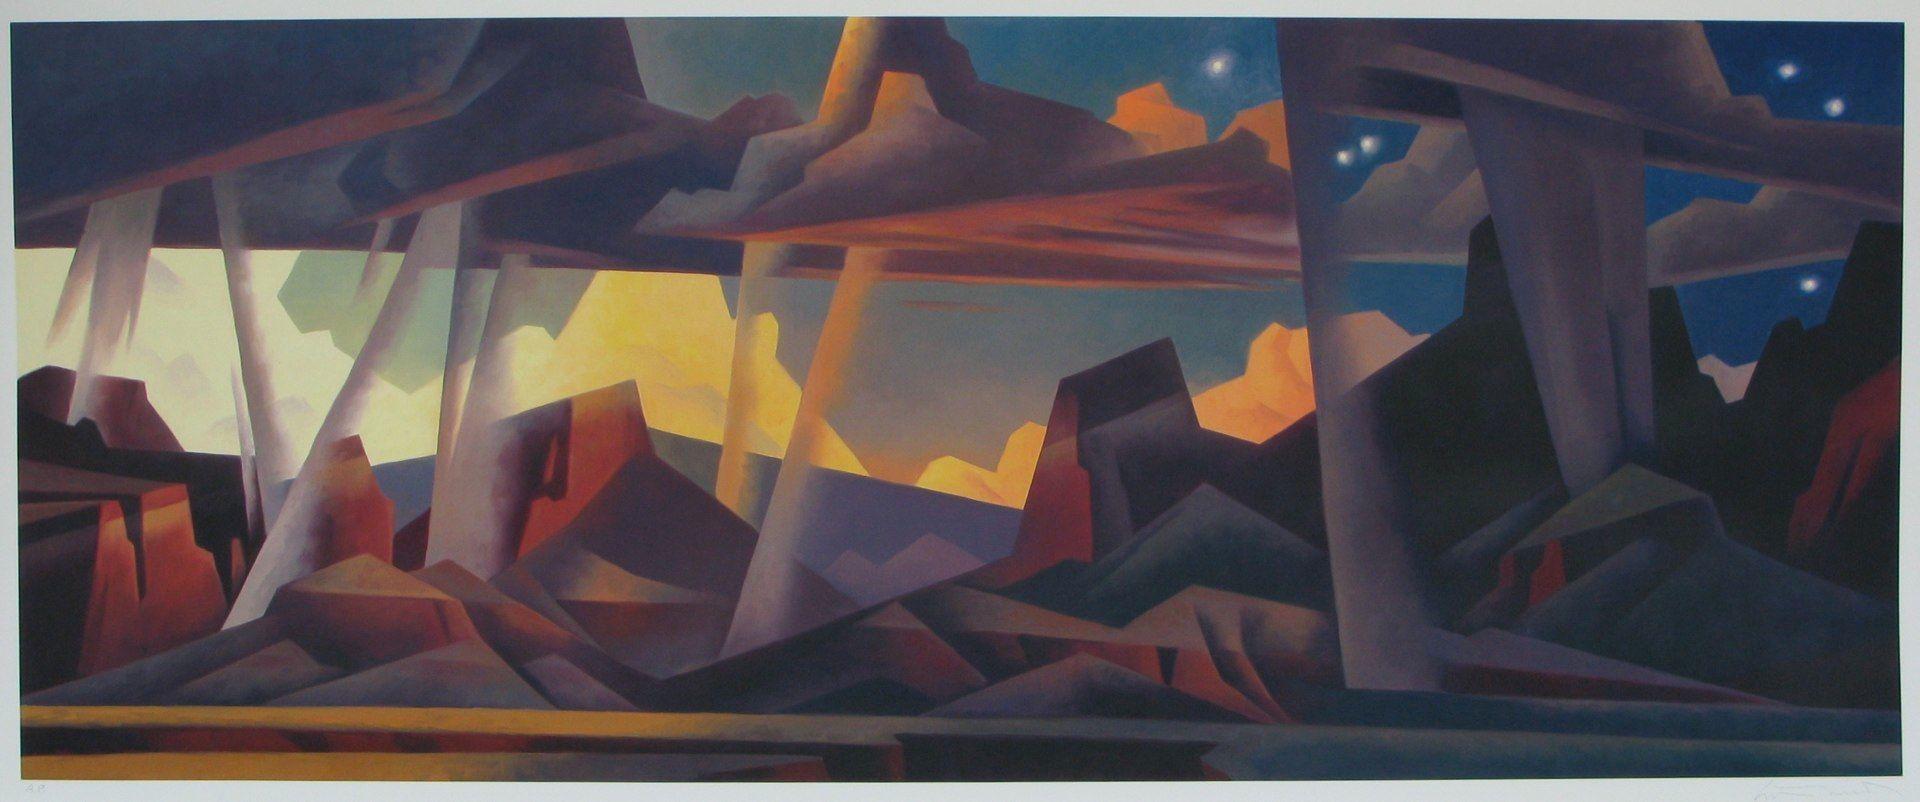 Ed Mell Fine Art Collier Gallery Ltd